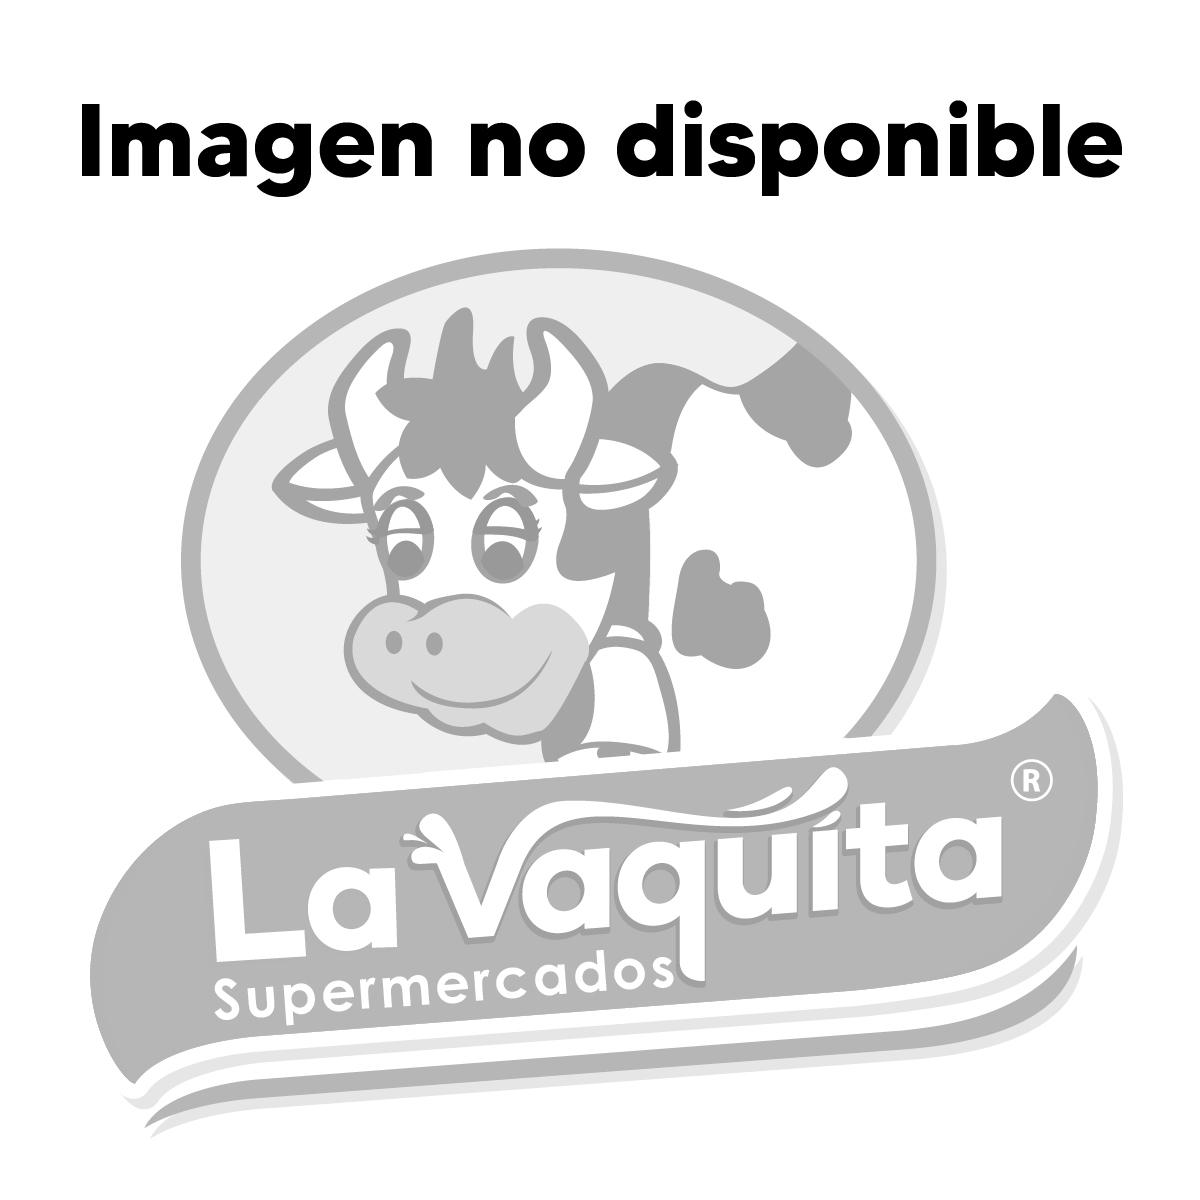 SERVILLETA FAVORITA 320U EXPRESS